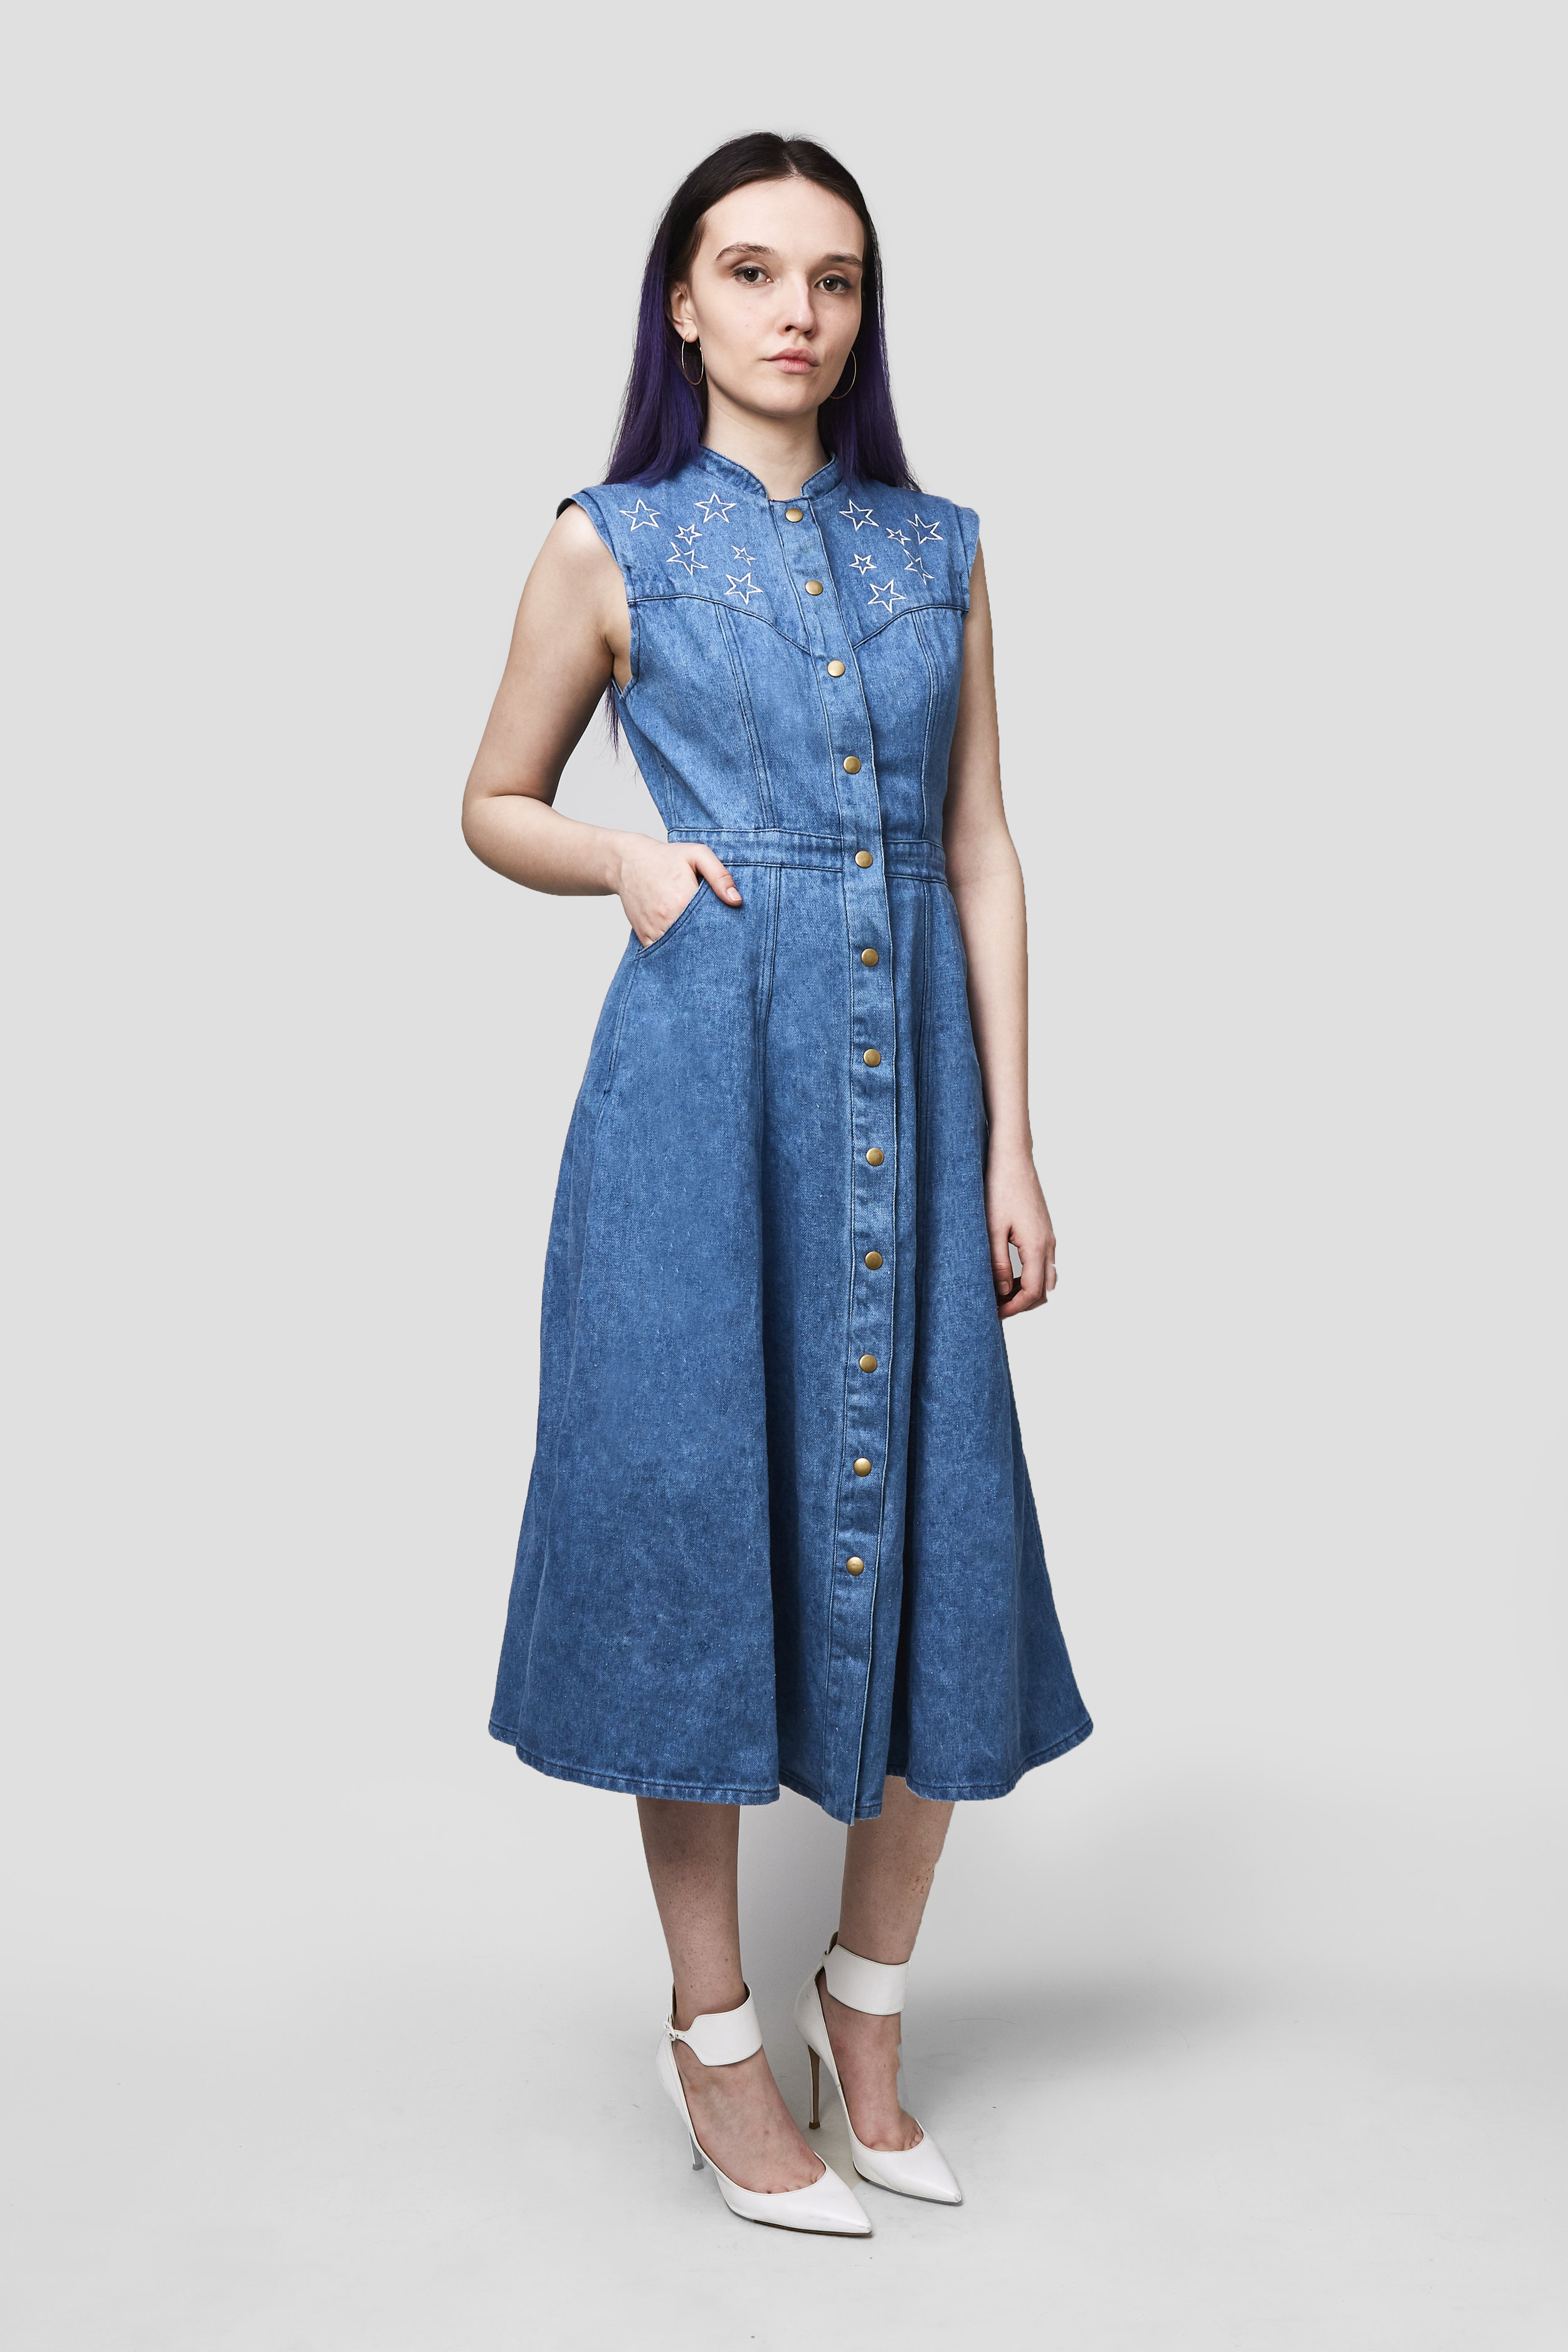 - The Gina Dress in Hemp Denim